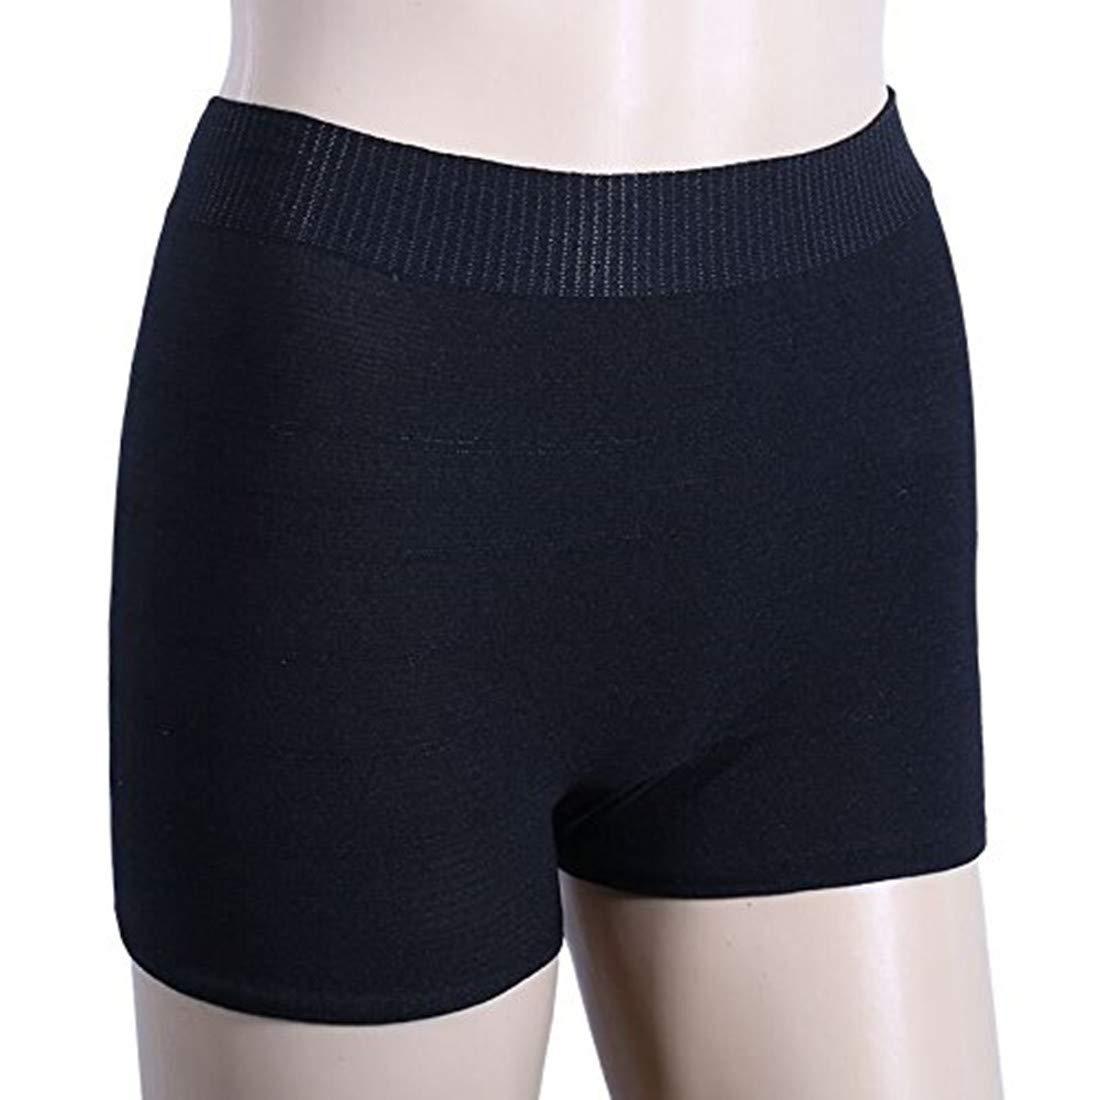 Amazon.com: Women Mesh Postpartum Panties Washable ...